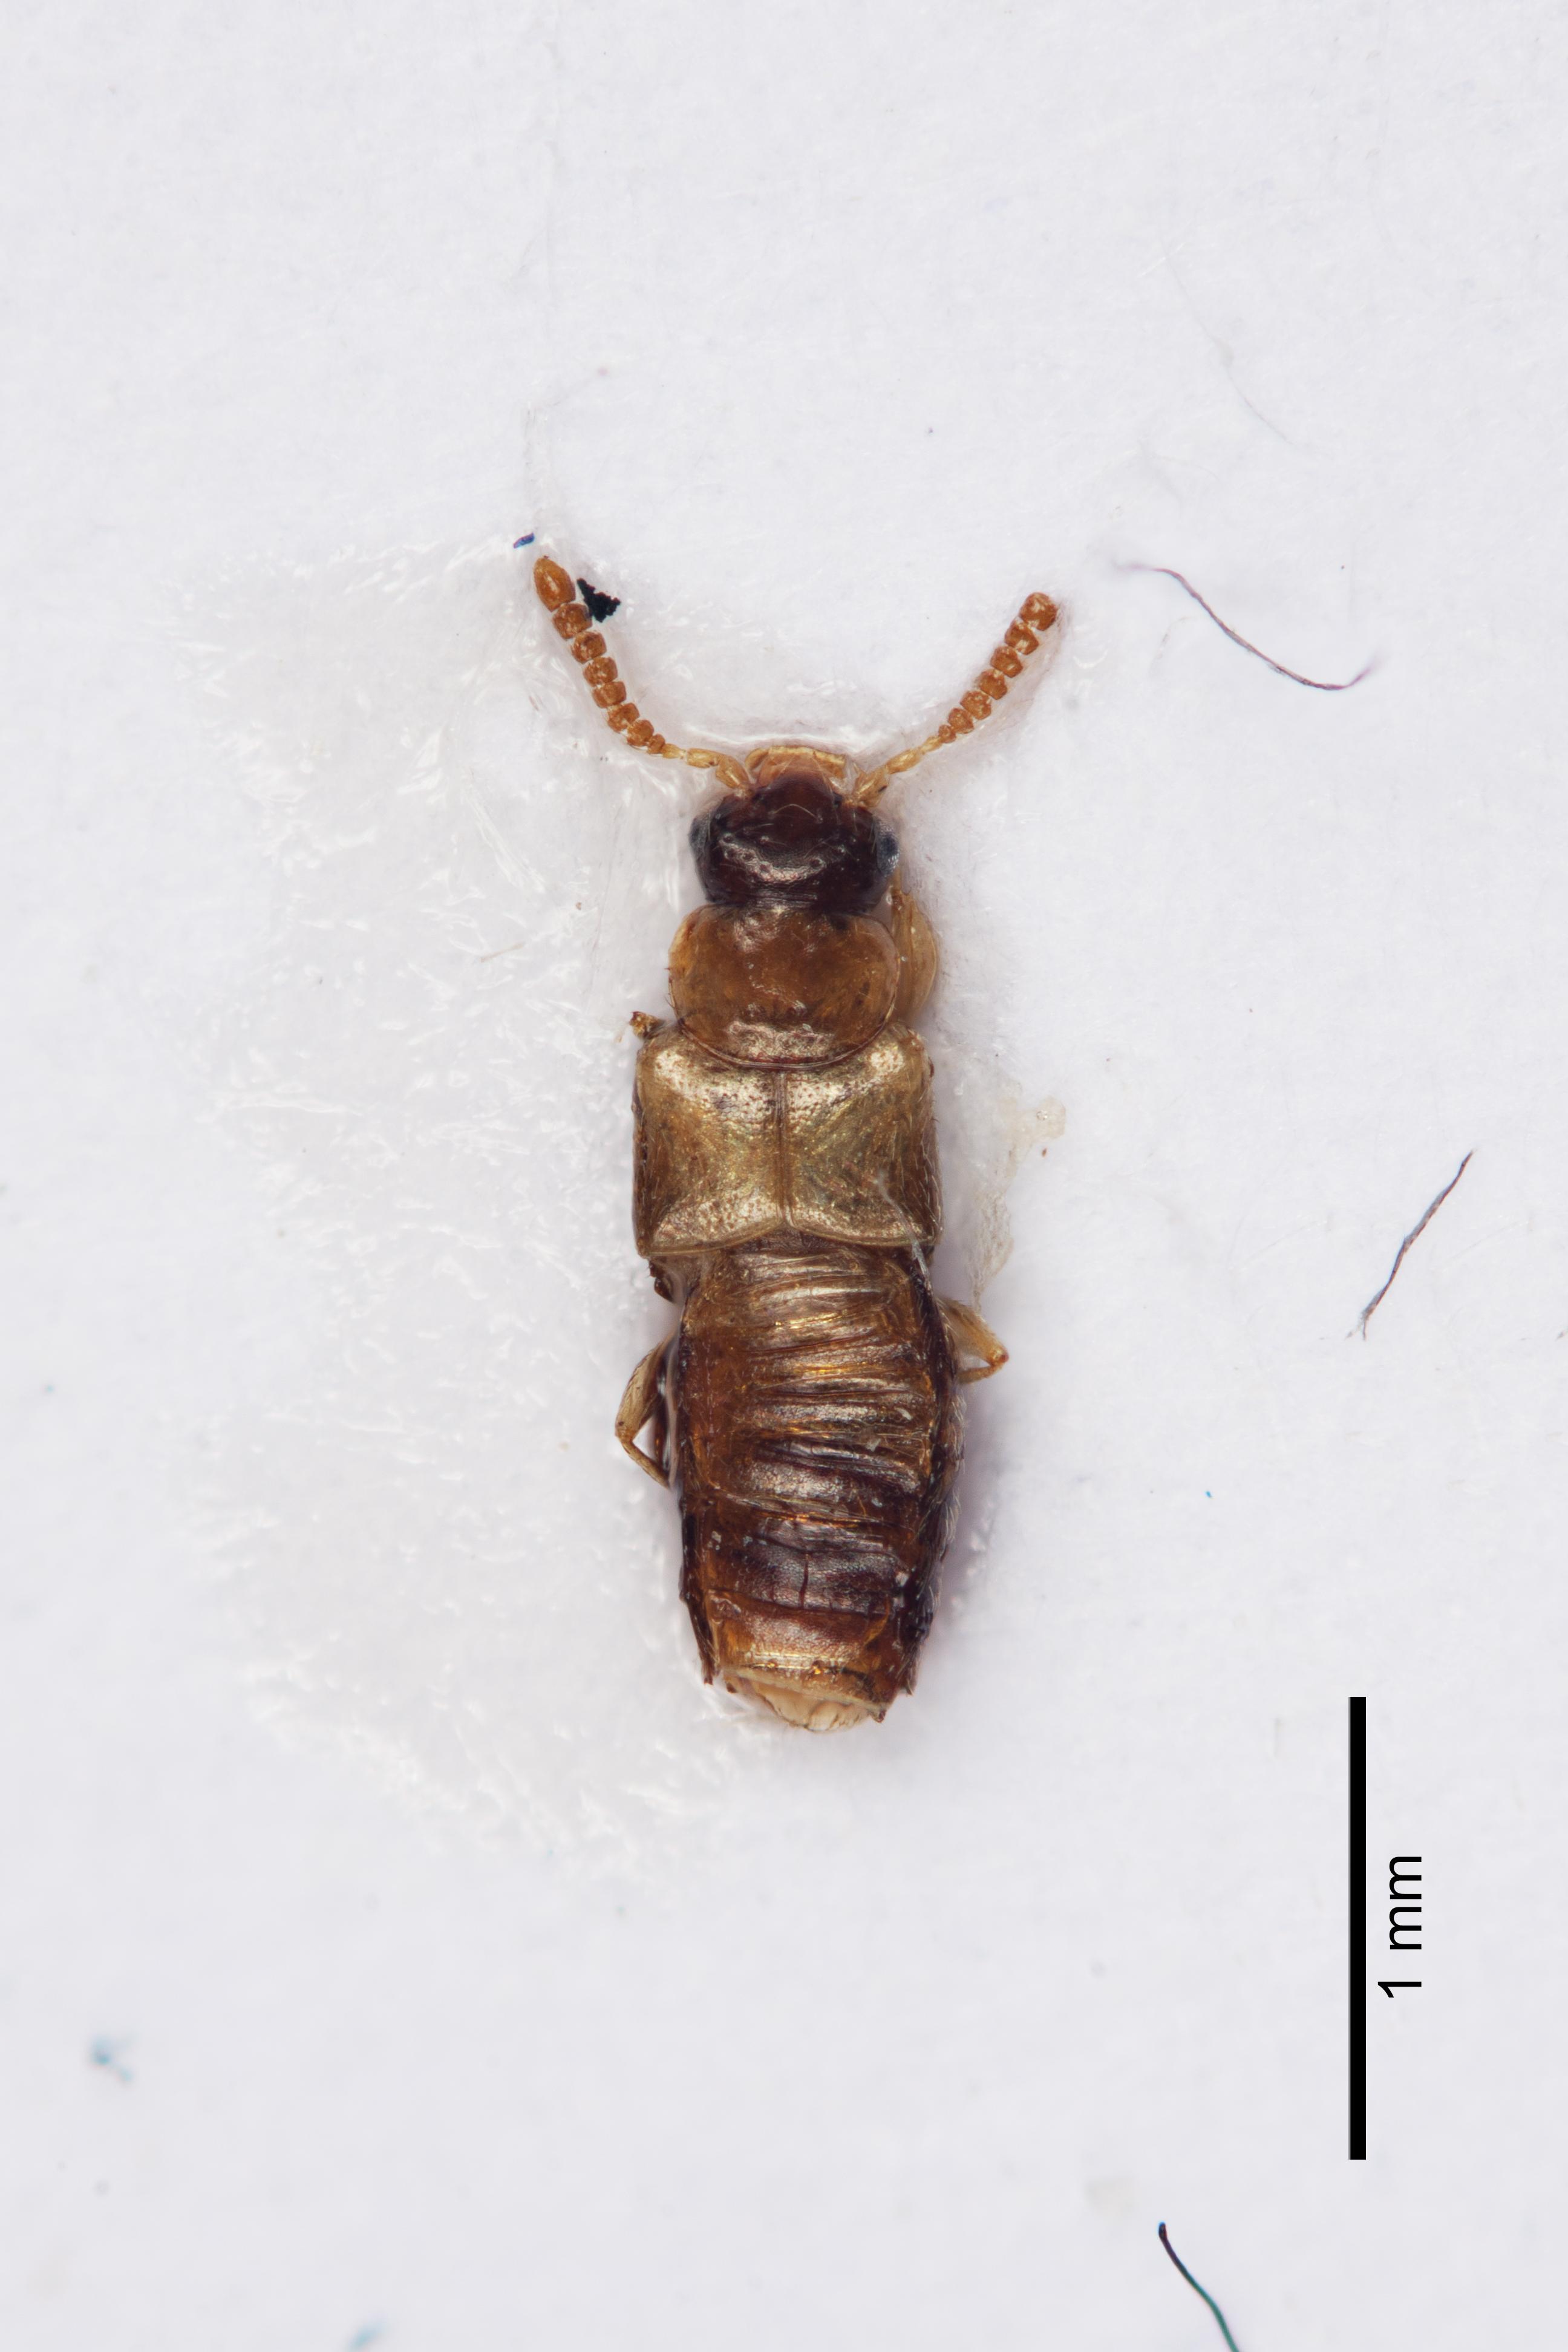 Image of Gyrophaena nanoides